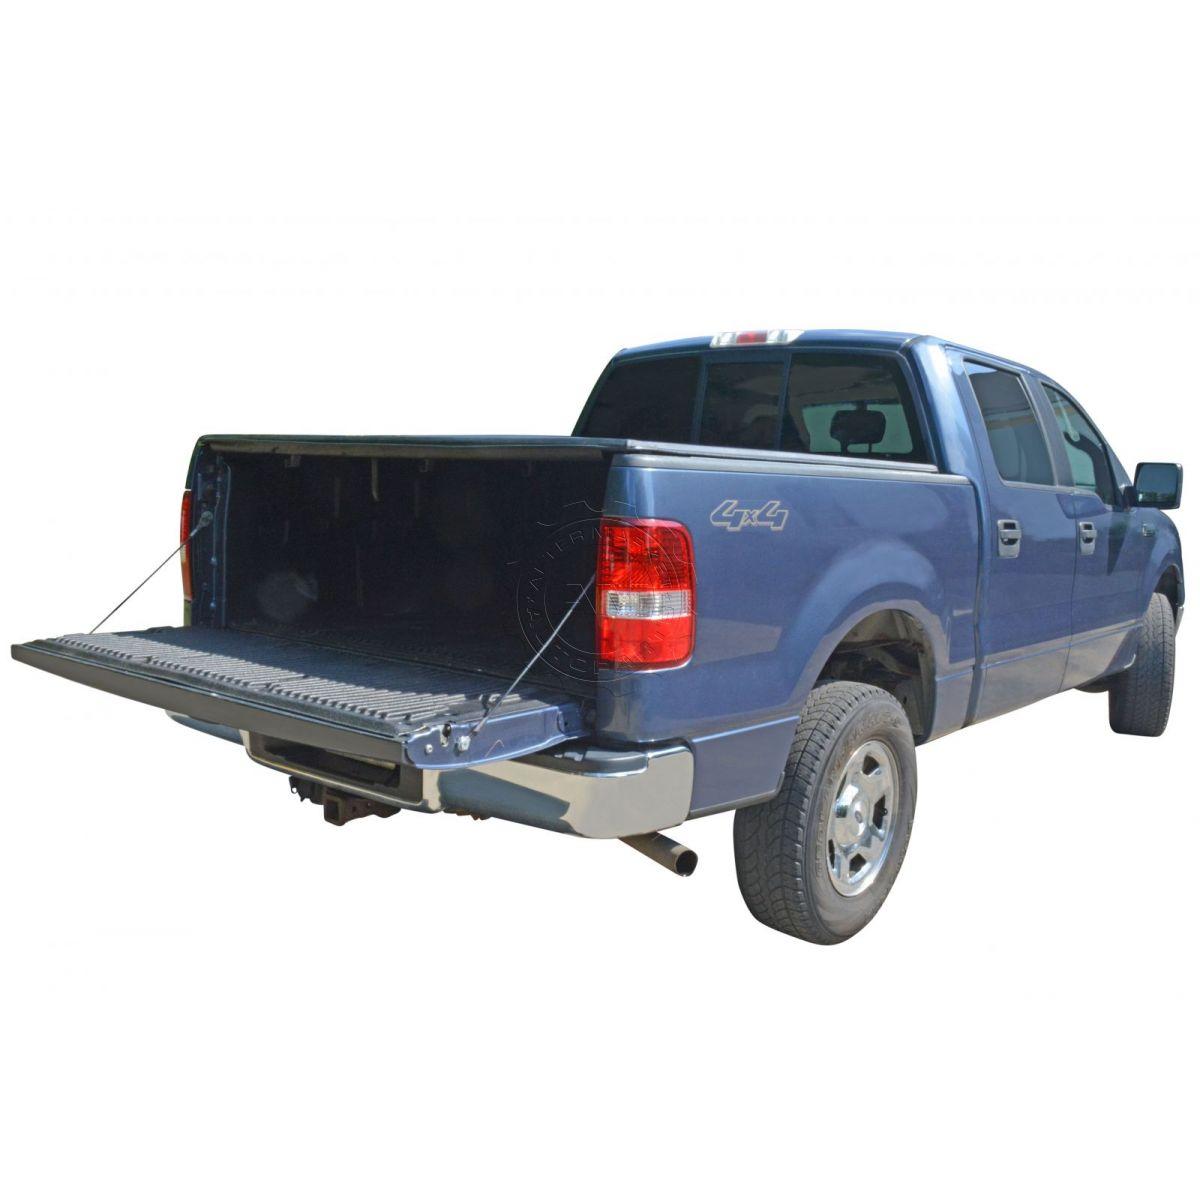 tonneau cover lock roll for ford ranger pickup truck 6ft bed new 192659262400 ebay. Black Bedroom Furniture Sets. Home Design Ideas